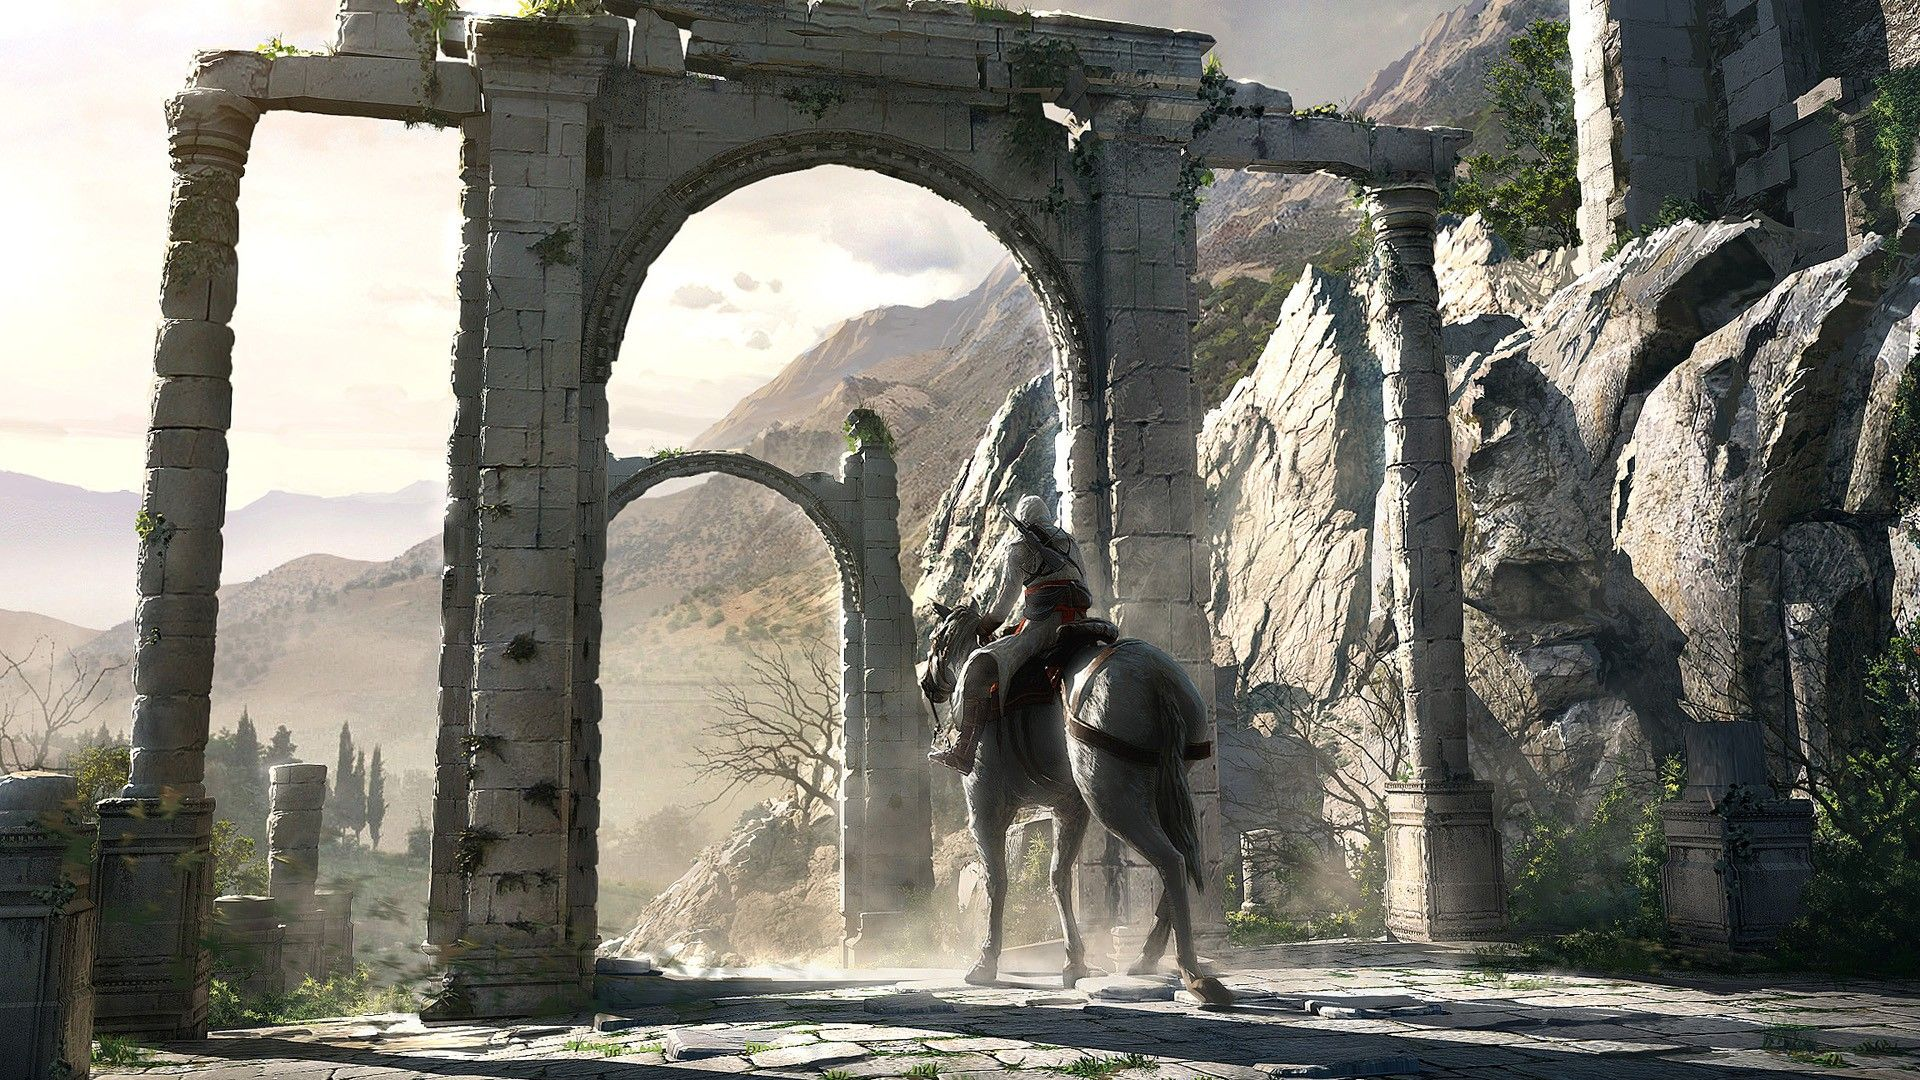 Popular Wallpaper Horse Assassin'S Creed - 1d6b7f6d84ad7e28218b5312780cdb4e  Picture_959661.jpg